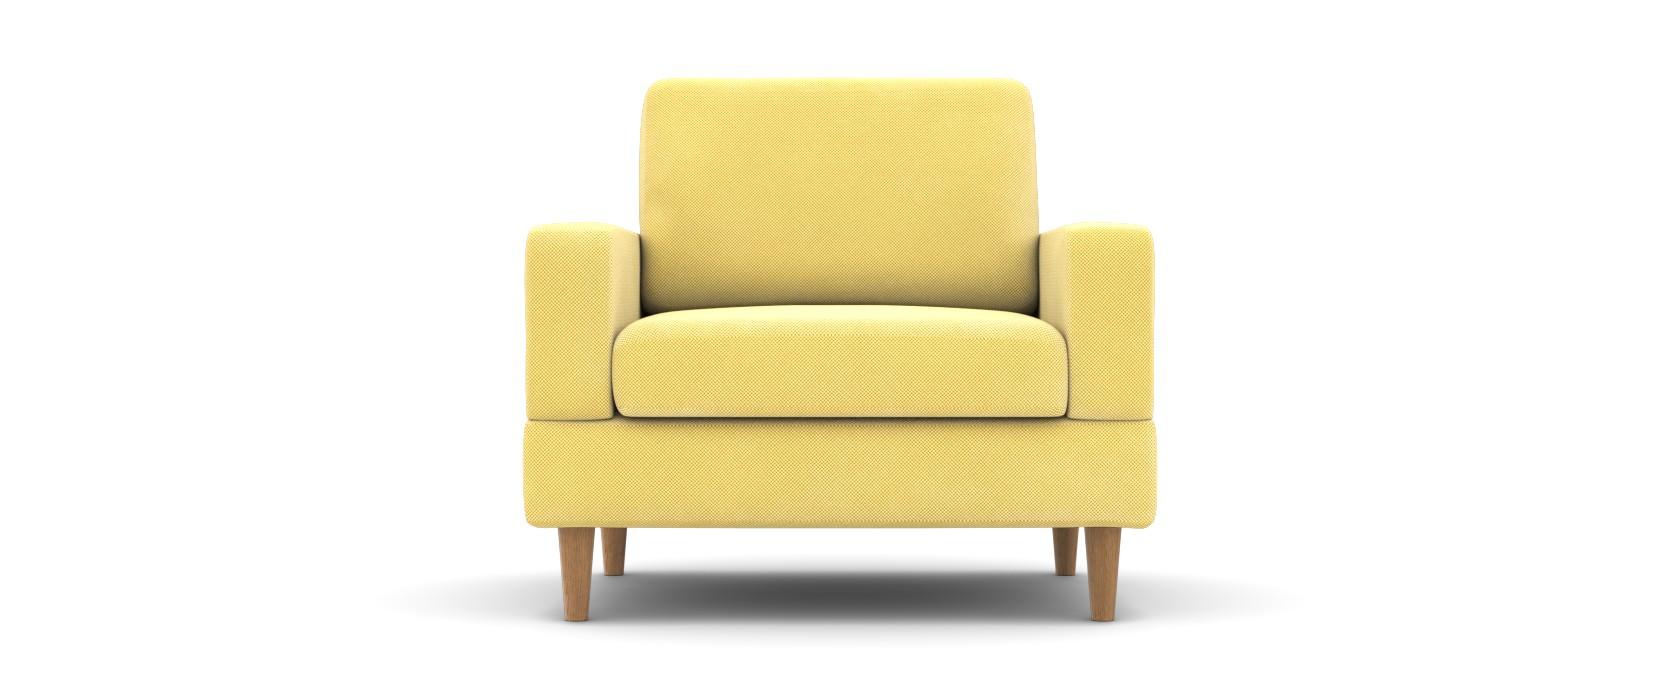 Кресло Bruno - Pufetto